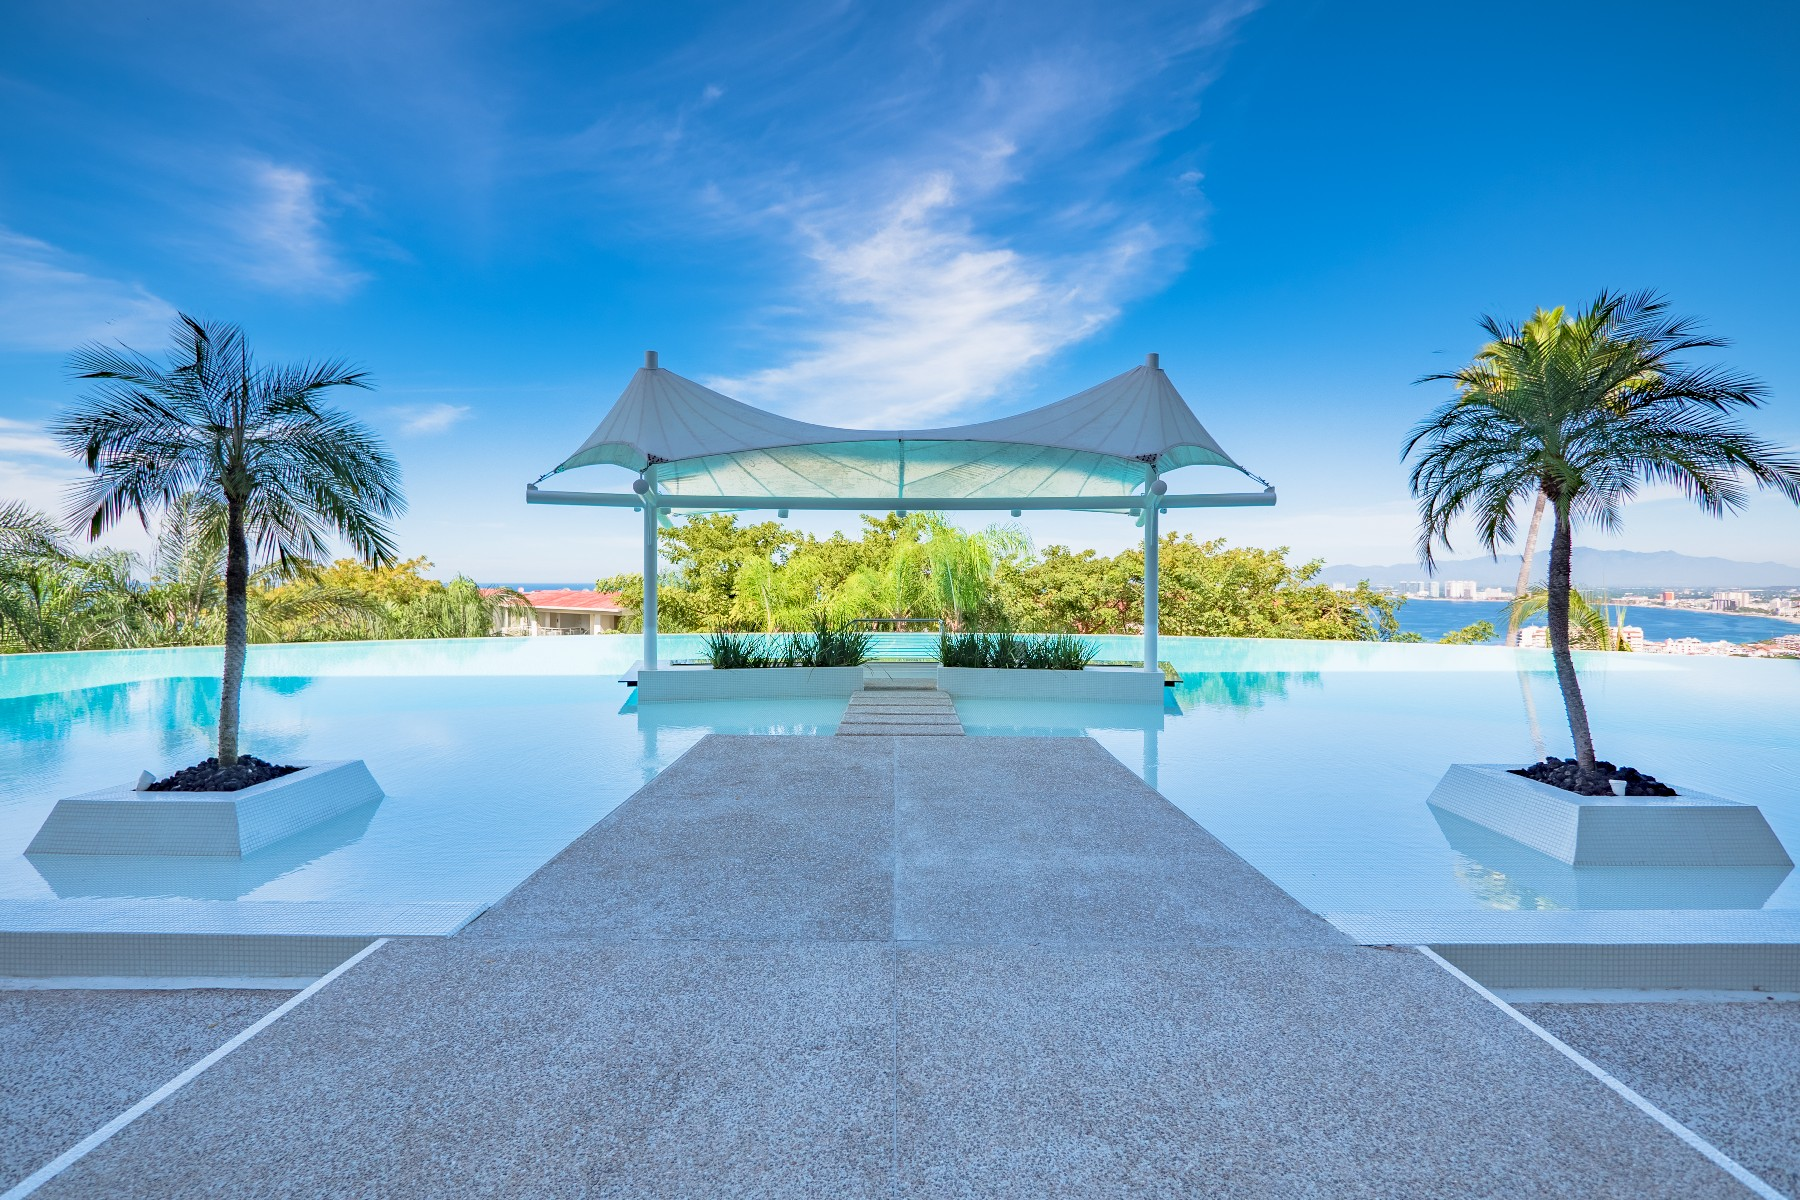 Horizon 404, Conchas Chinas, Puerto Vallarta